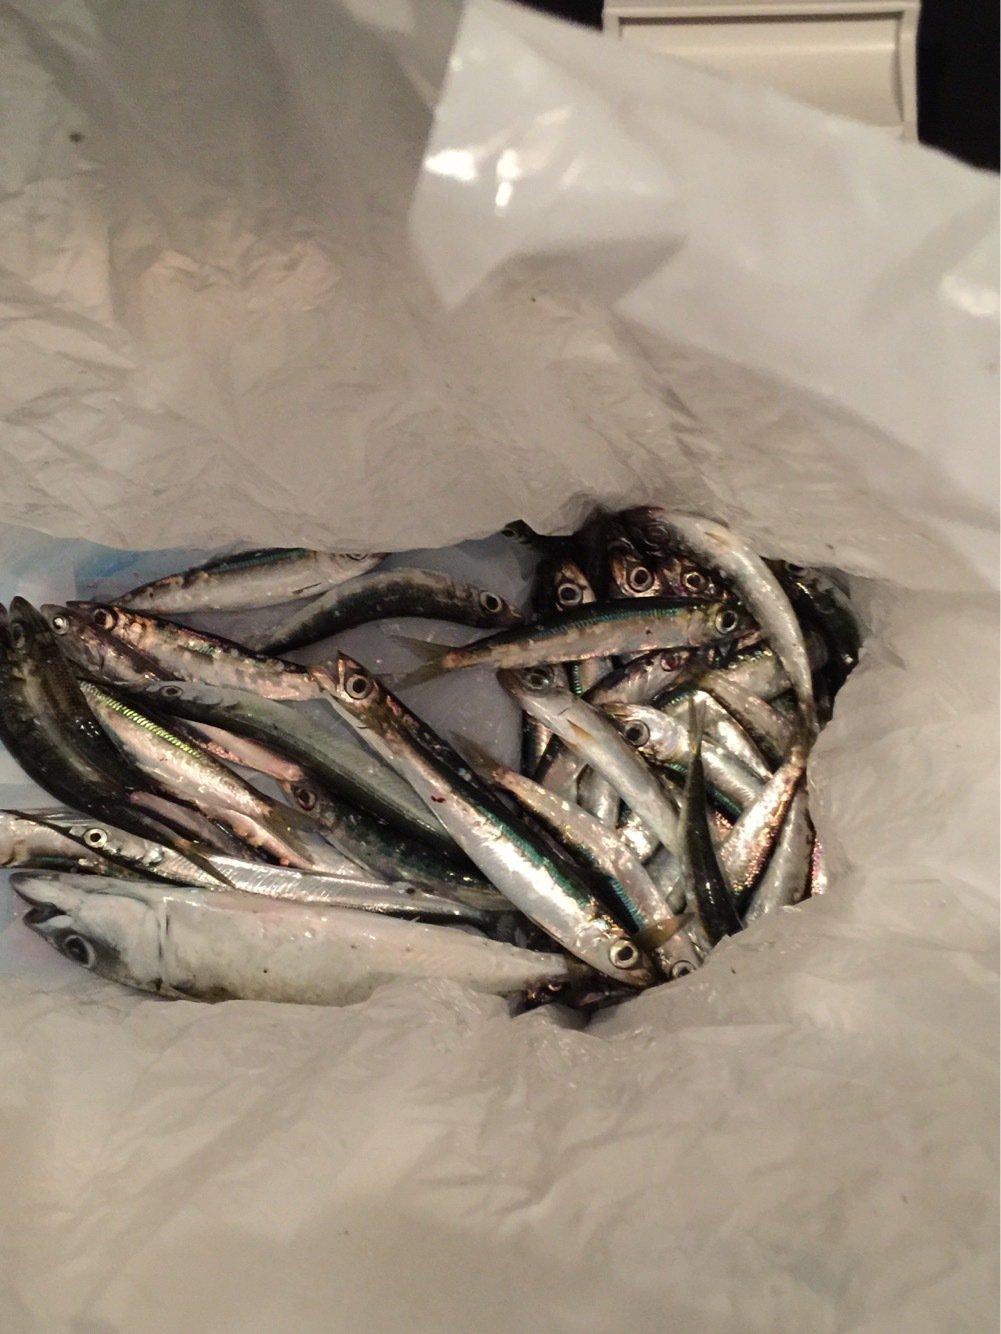 trumpeterhiro さんの投稿画像,写っている魚はサヨリ